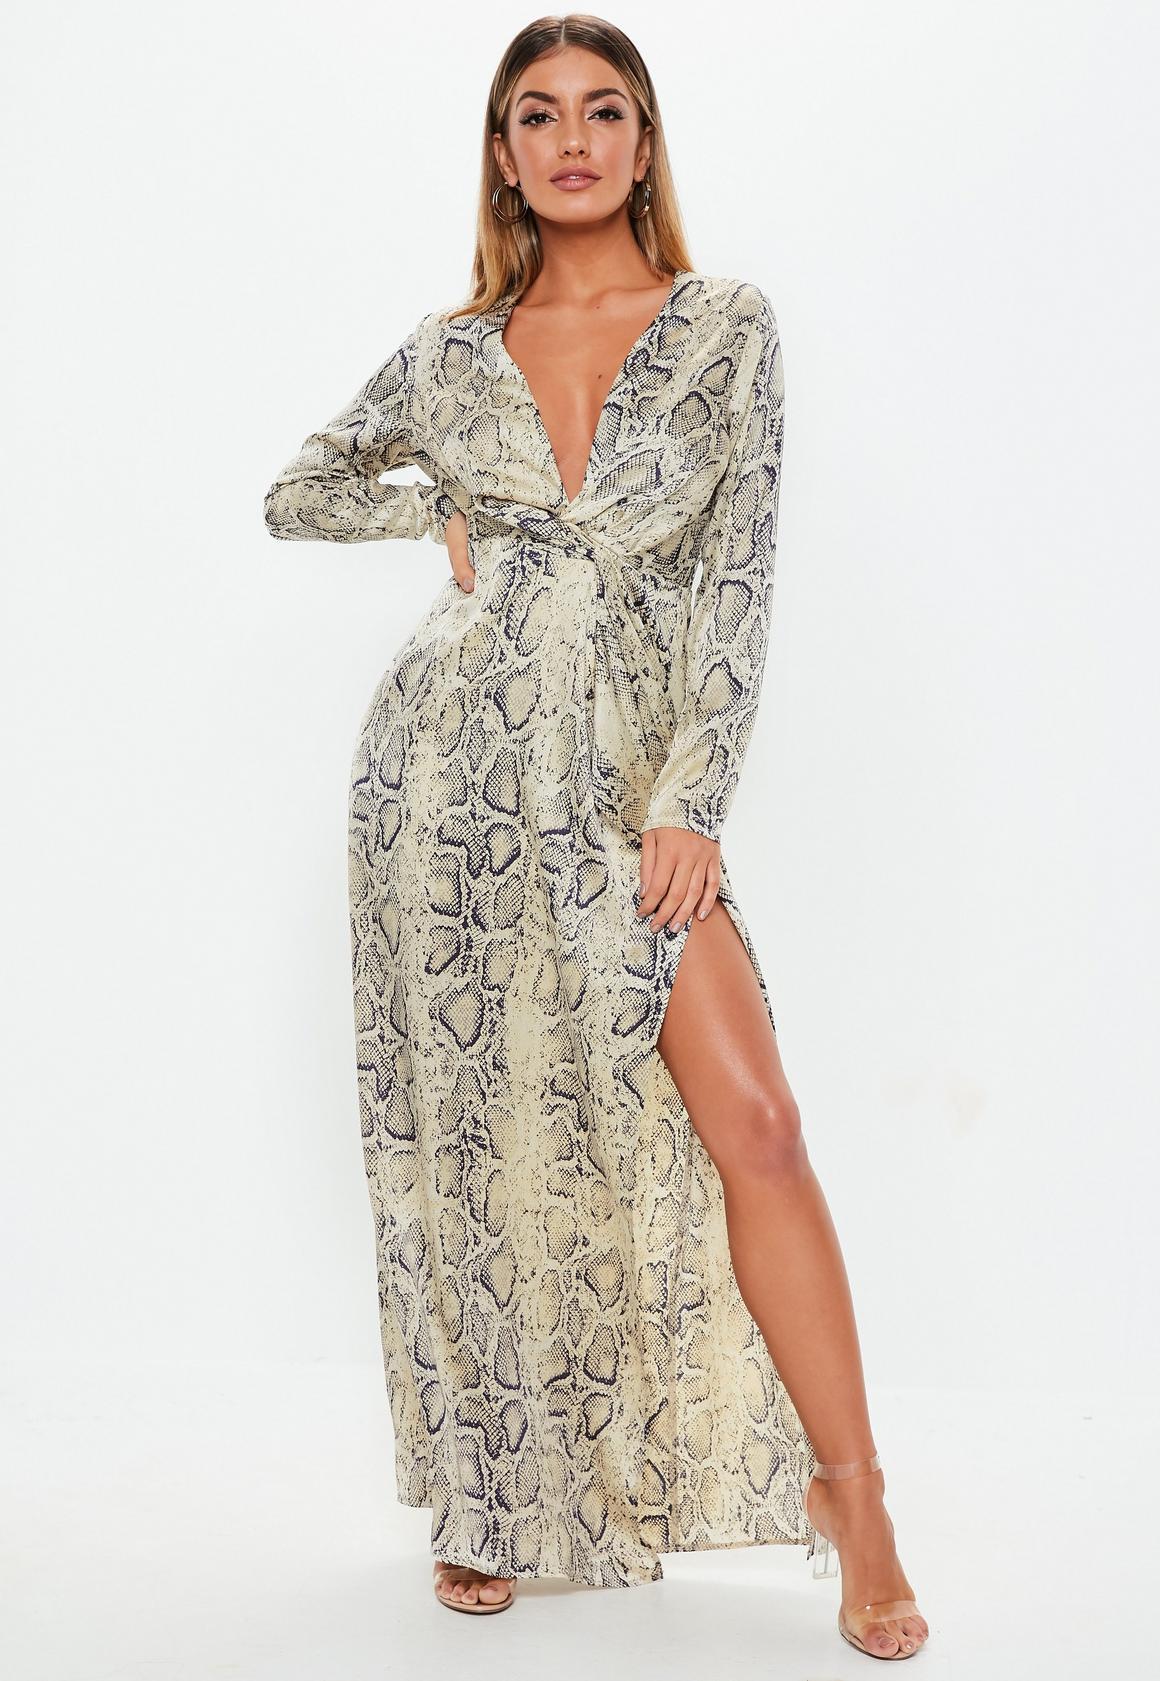 cream-snake-print-satin-twist-front-maxi-dress.jpg